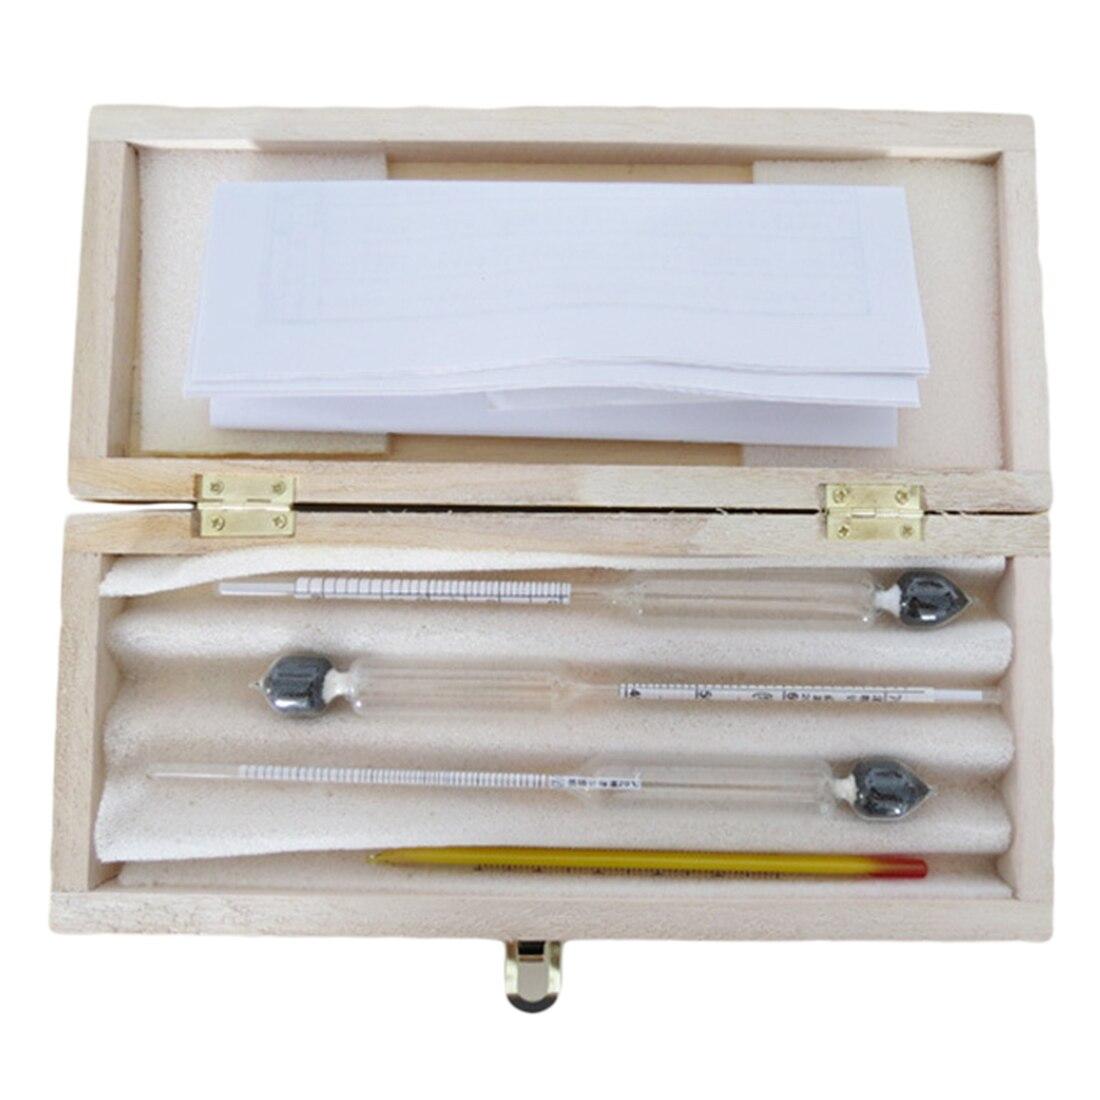 3pcs/Set Alcoholmeter Alcohol Meter wine Concentration Meter Alcohol Instrument Hydrometer Tester